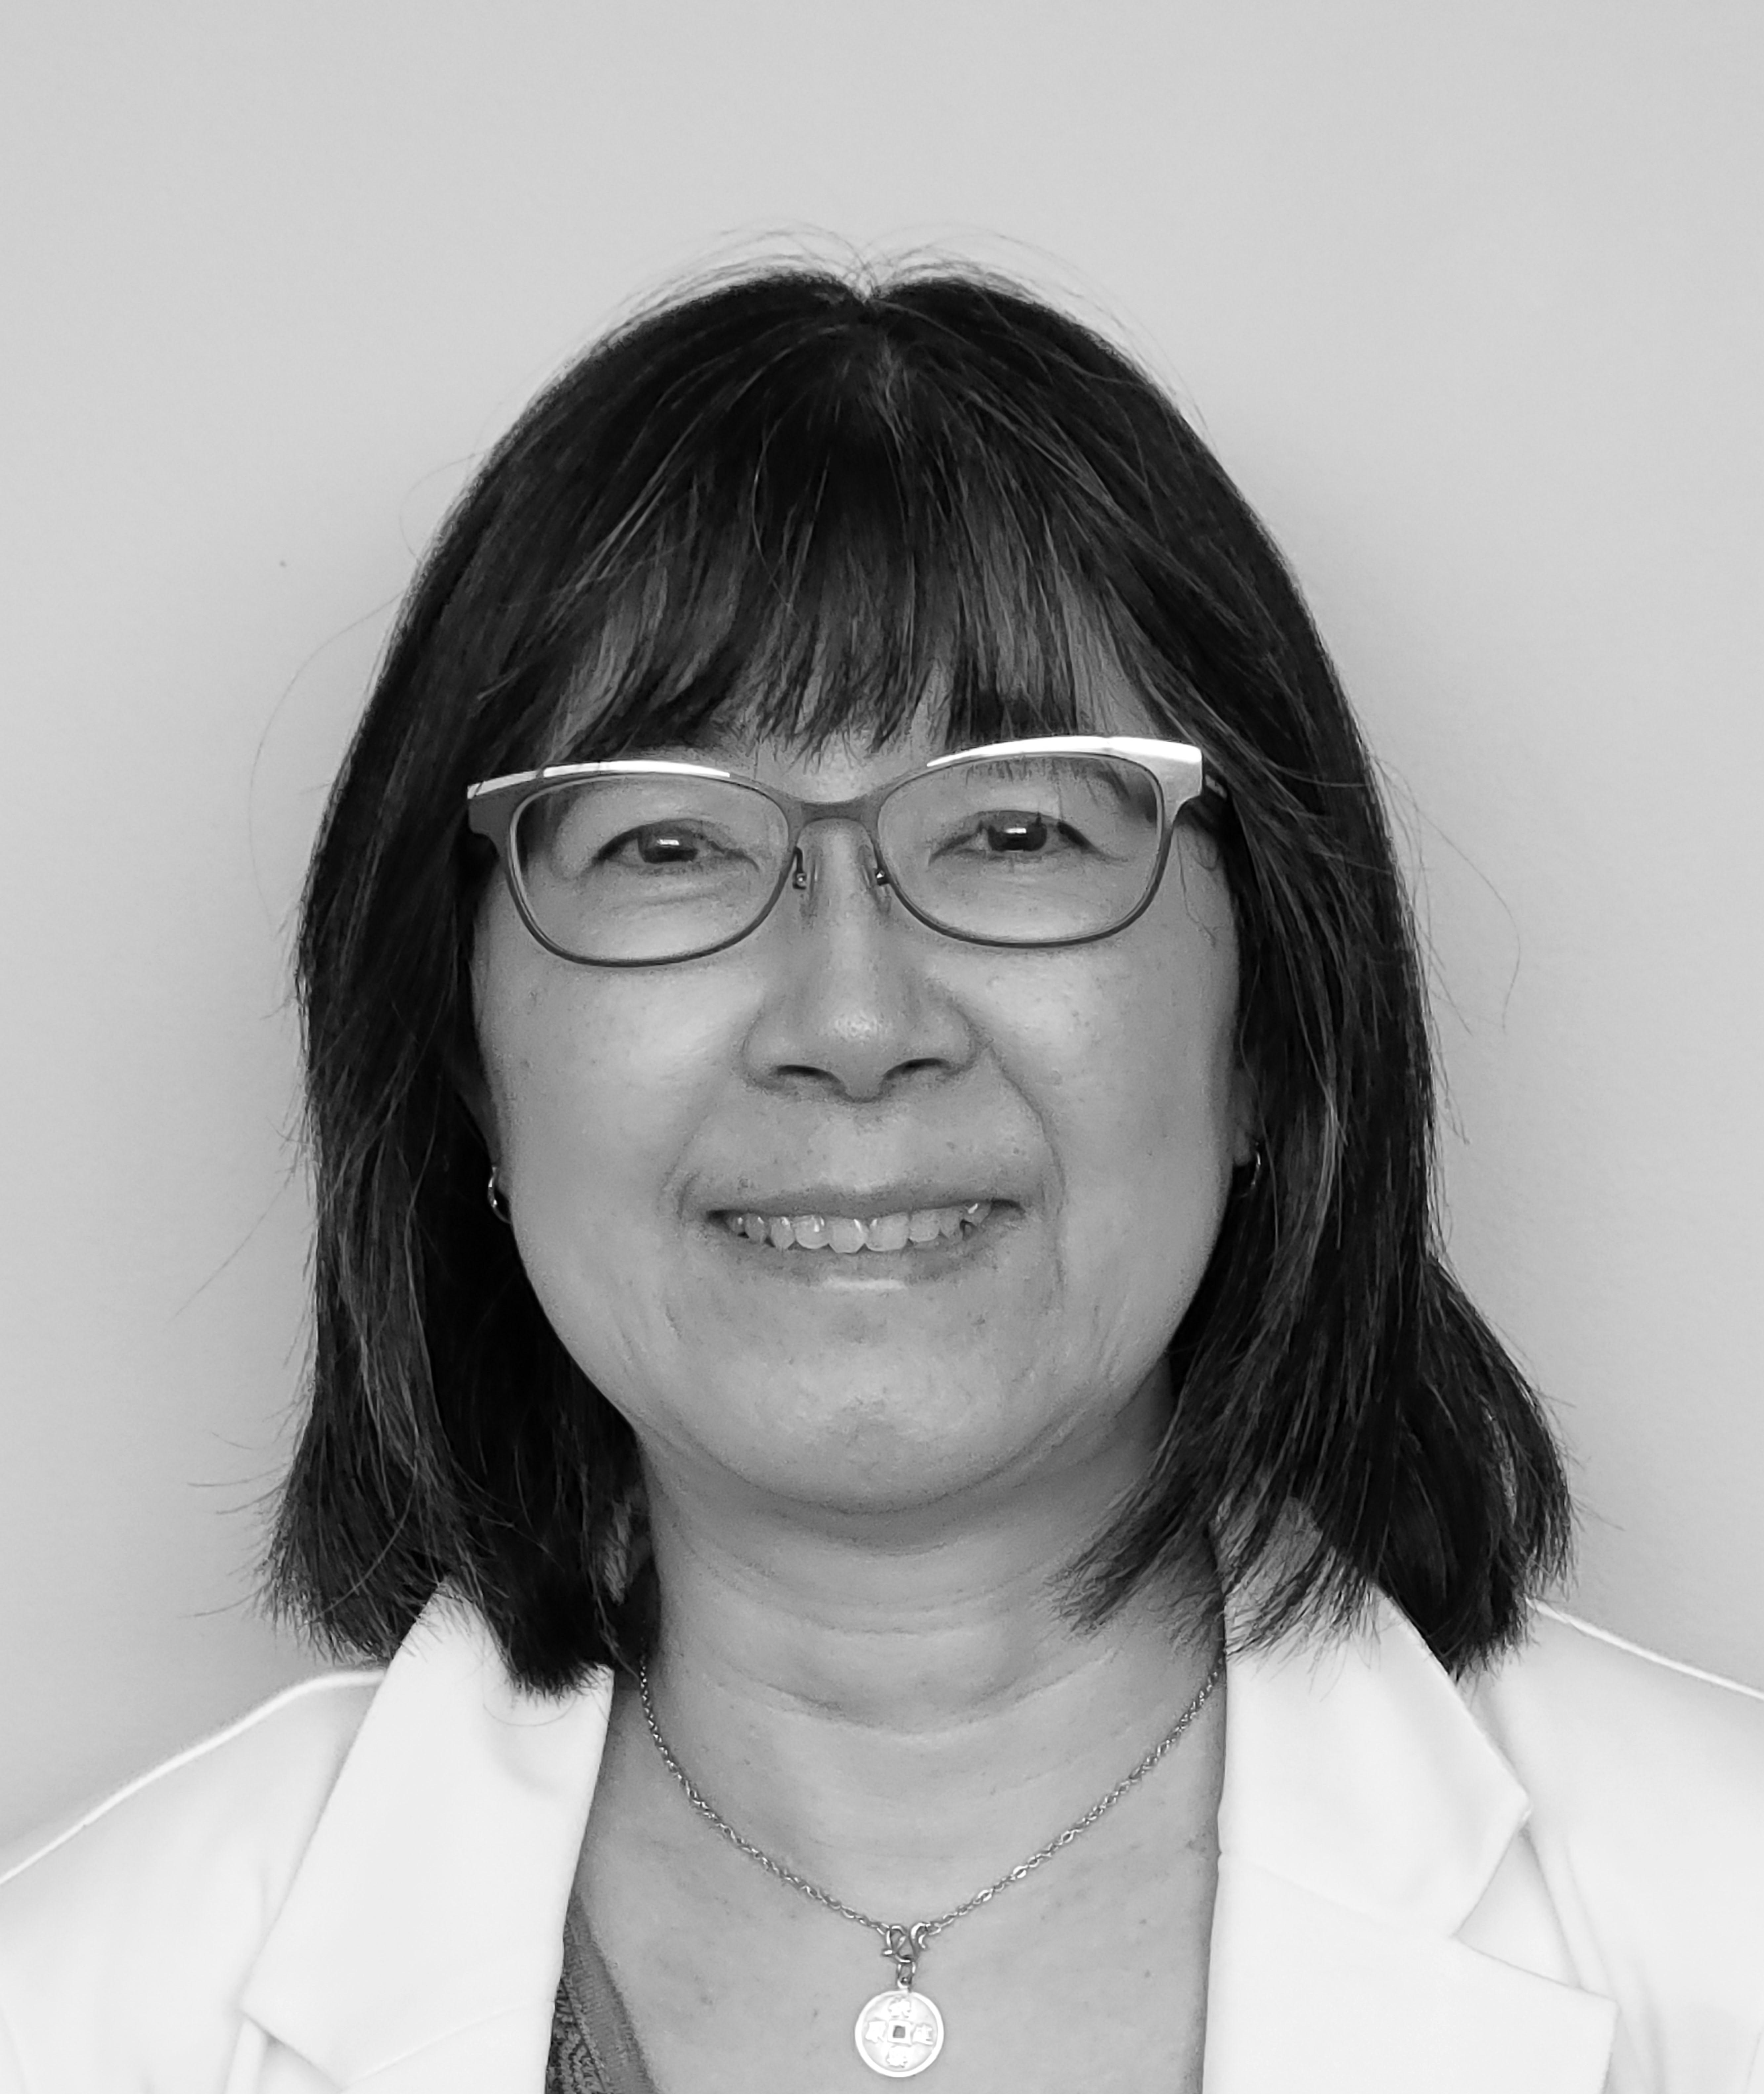 Photo of Judy Chan